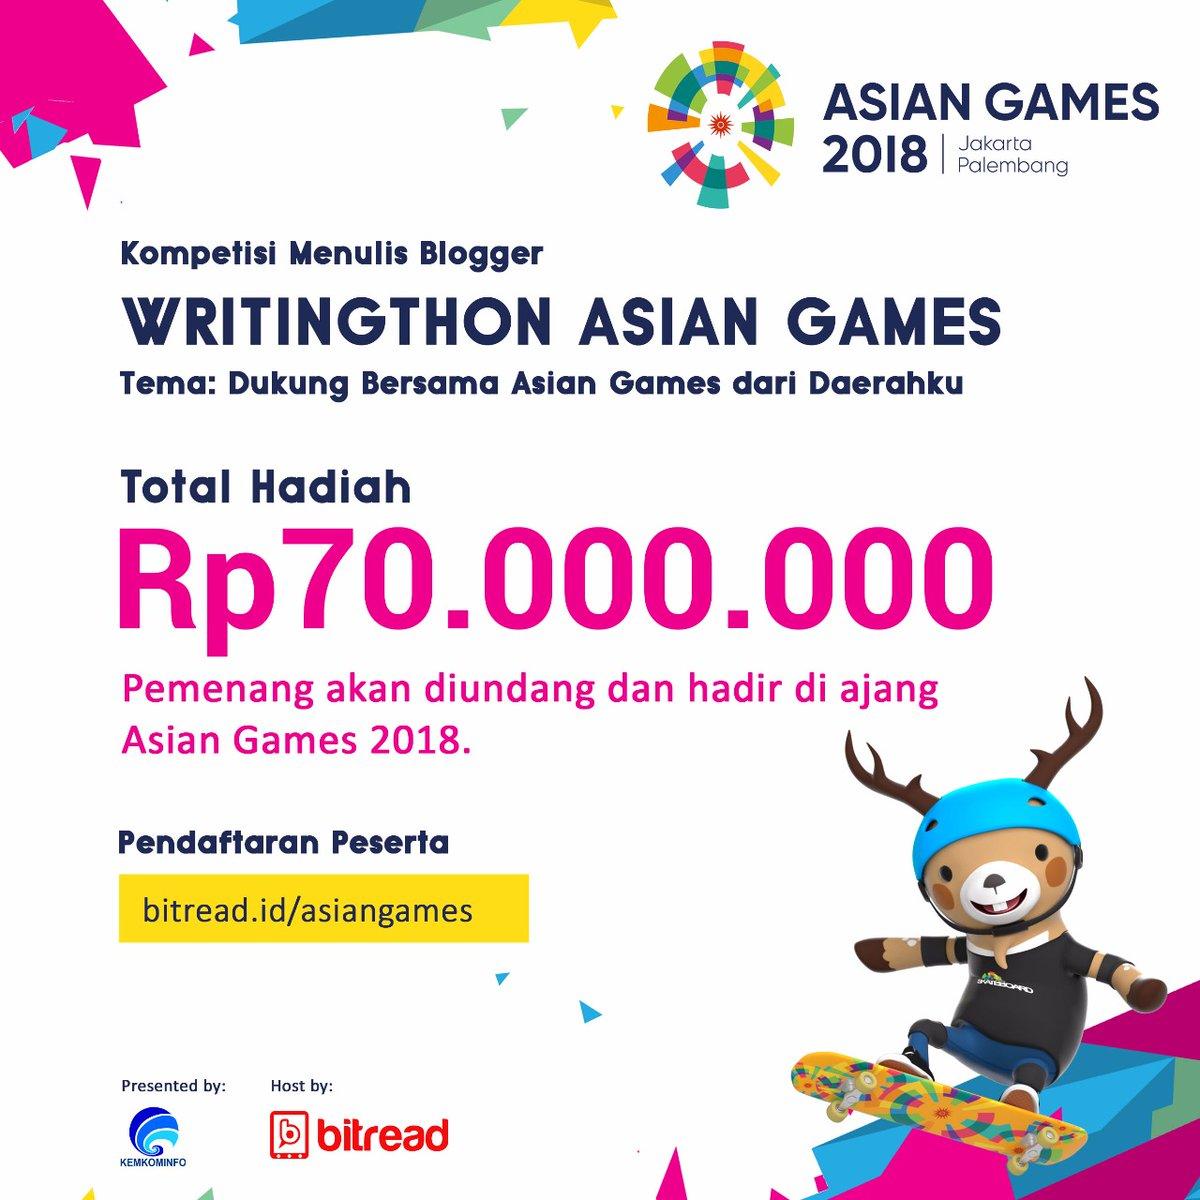 writingthon%2Basian%2Bgames%2B2018 - Asian Games Writingthon